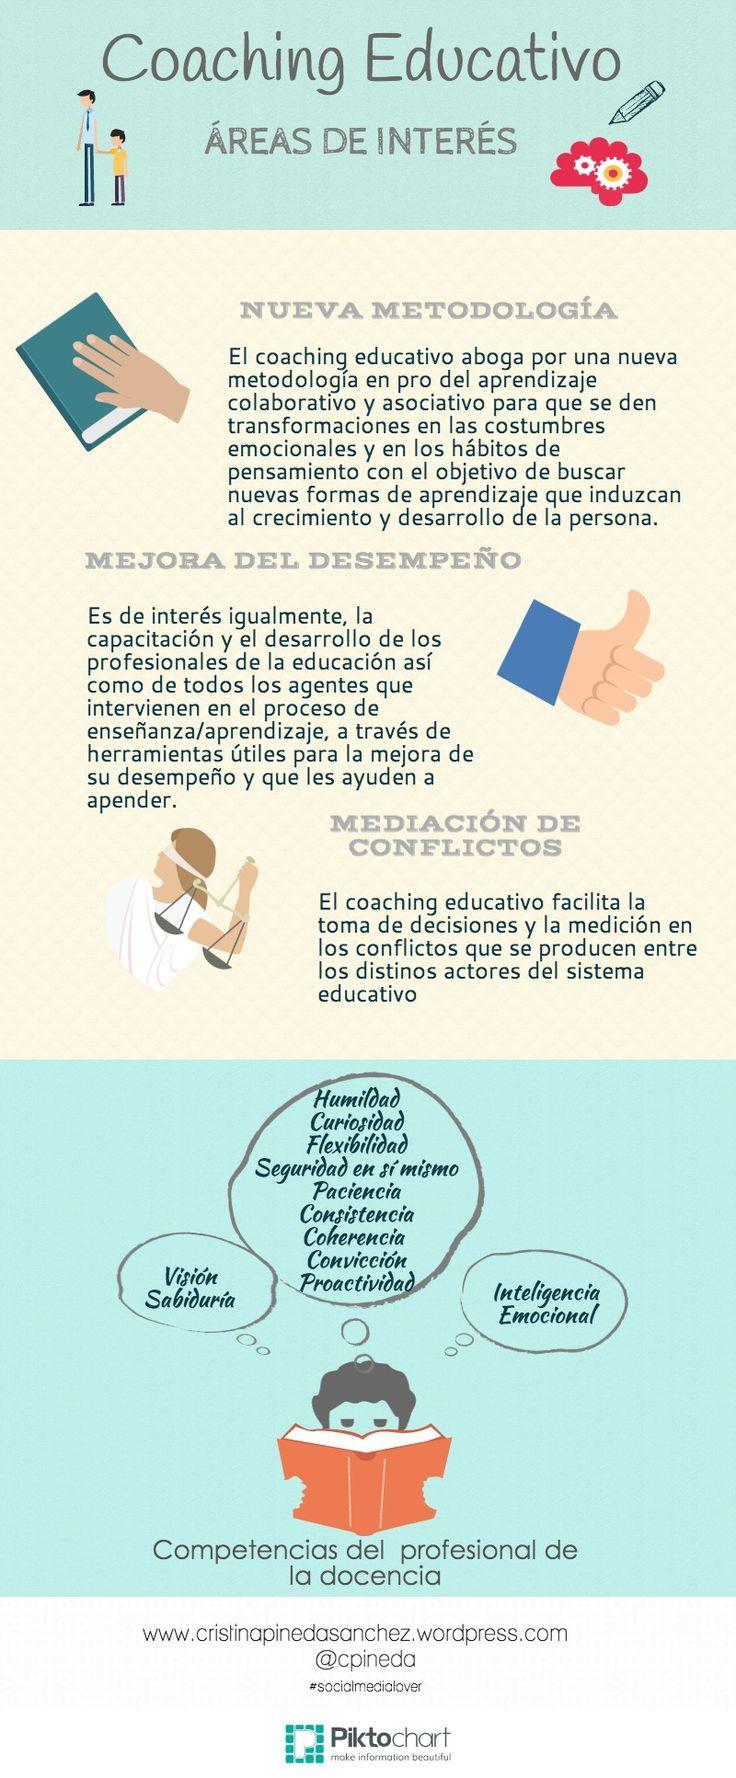 Coaching Educativo. Áreas de interés. #CoachingEducativo #Educación #InteligenciaEmocional